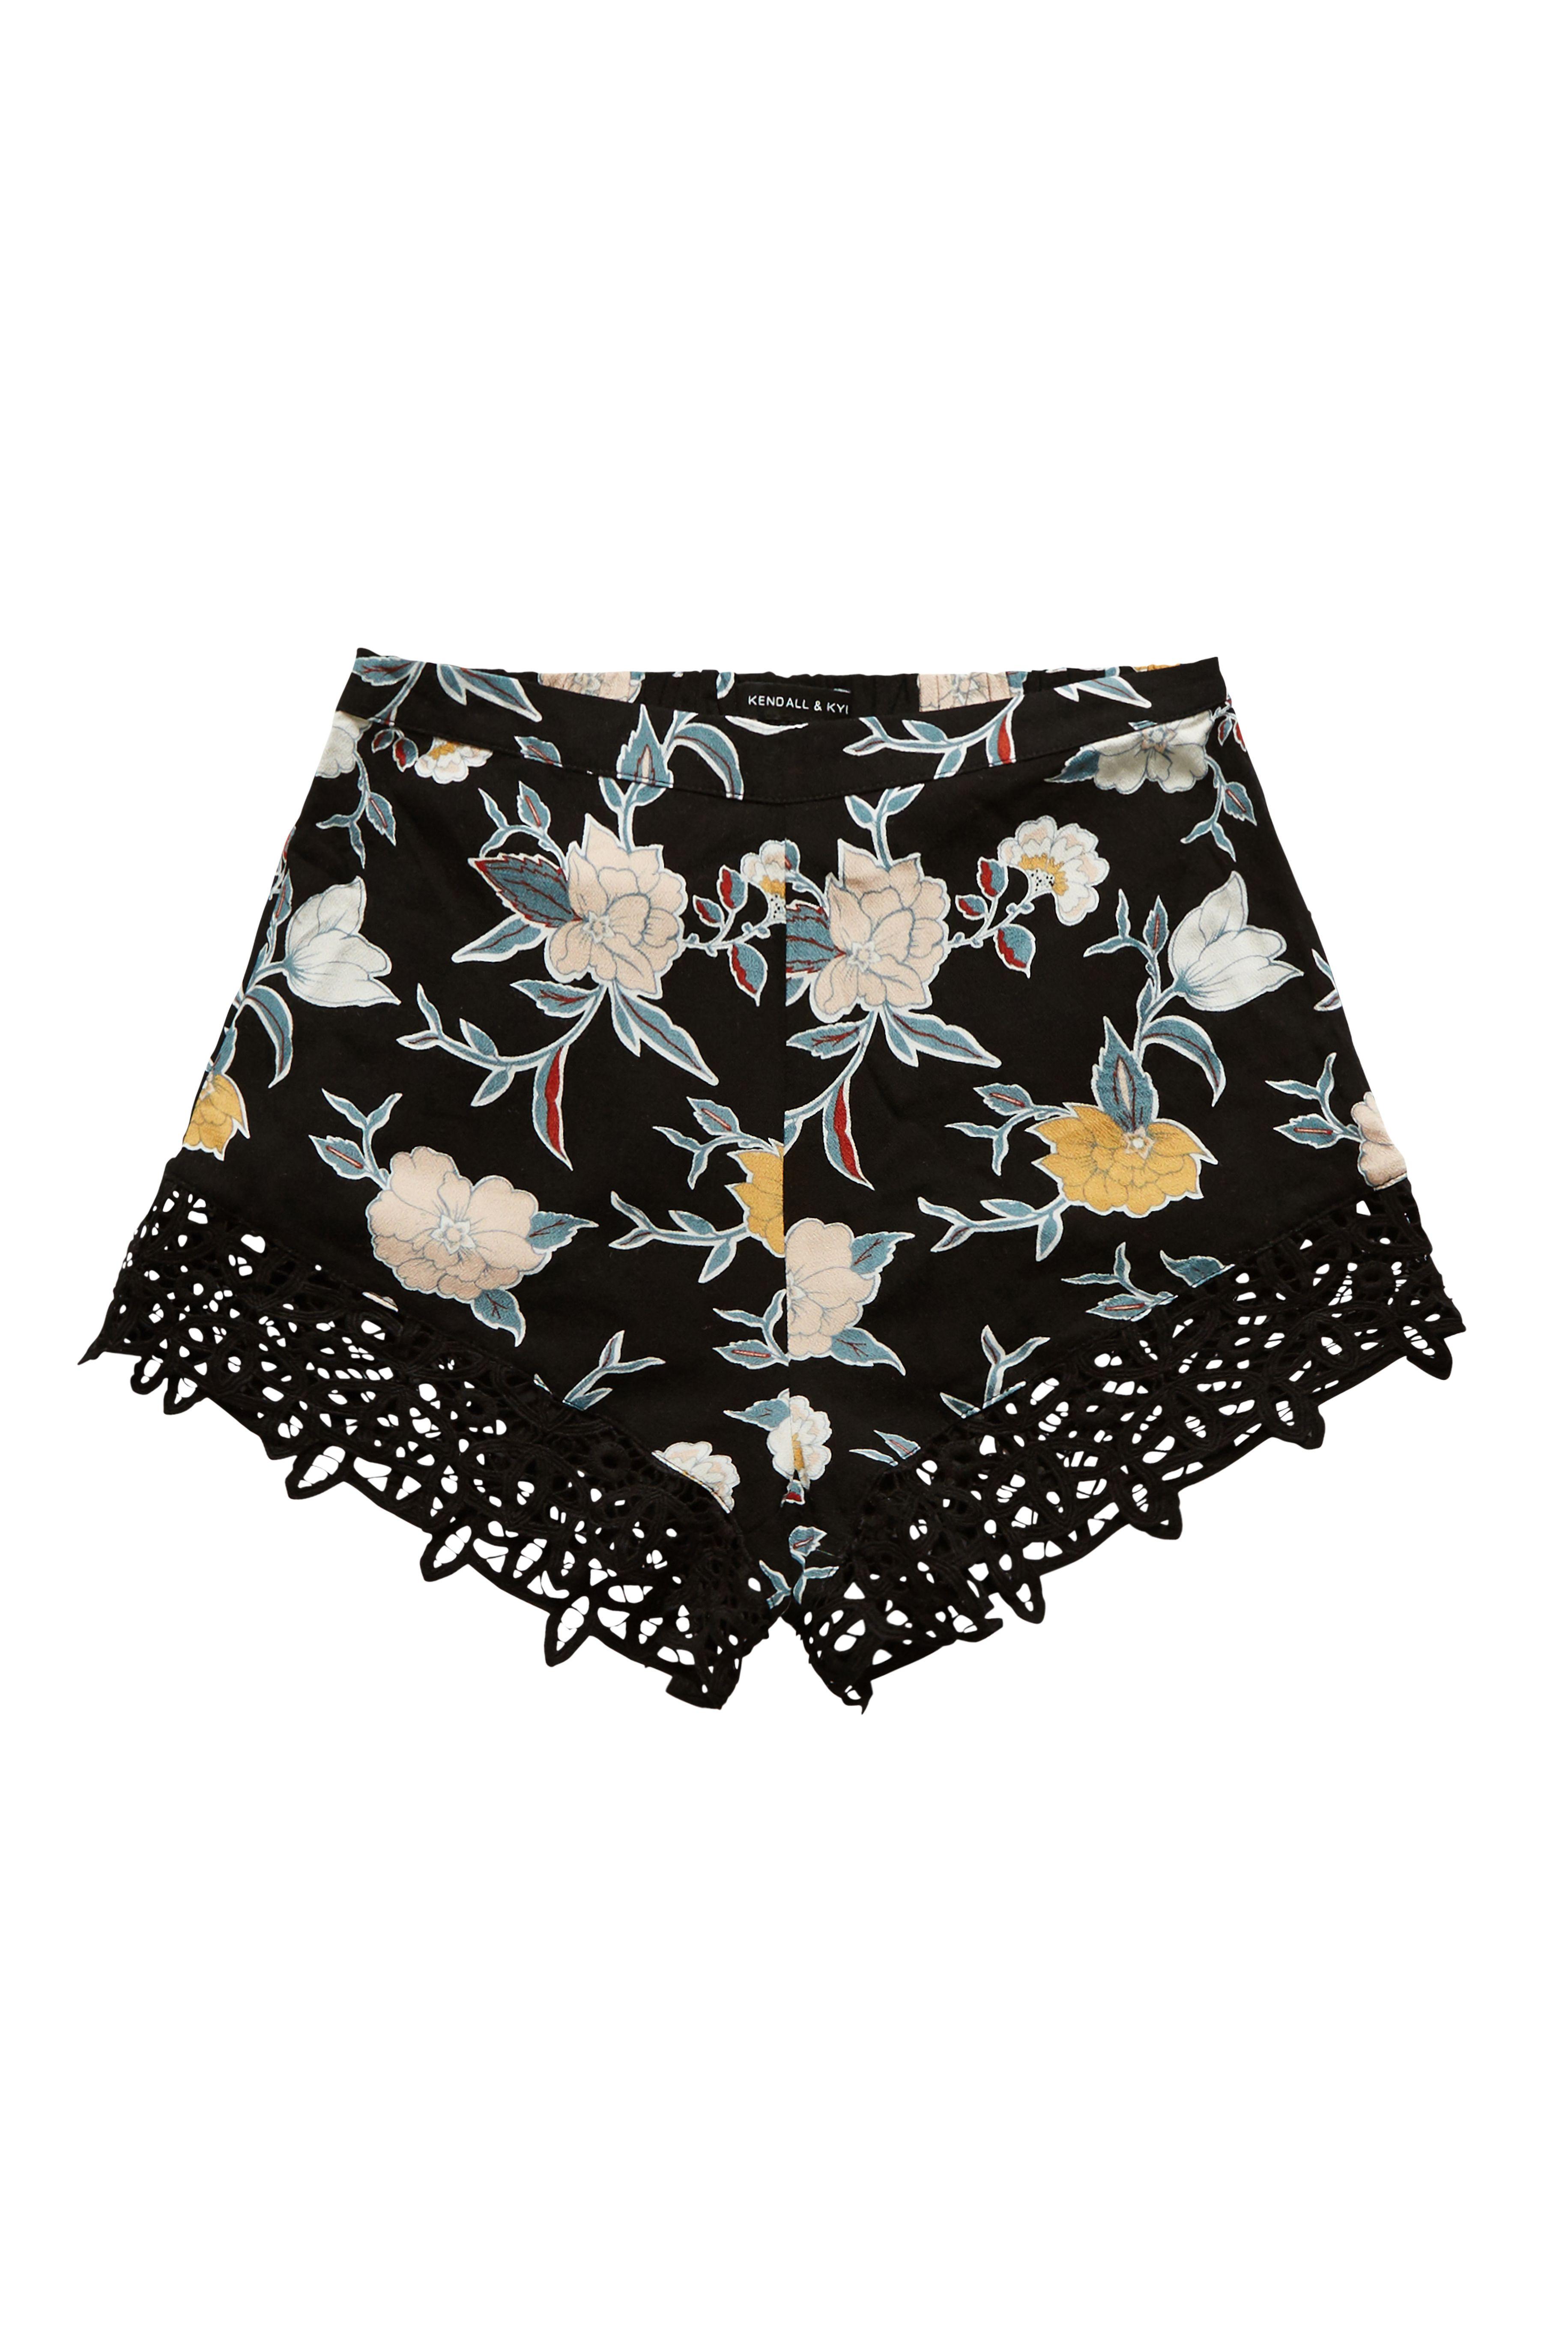 edd3b051d3 Black Jean Skirt Pacsun   Saddha